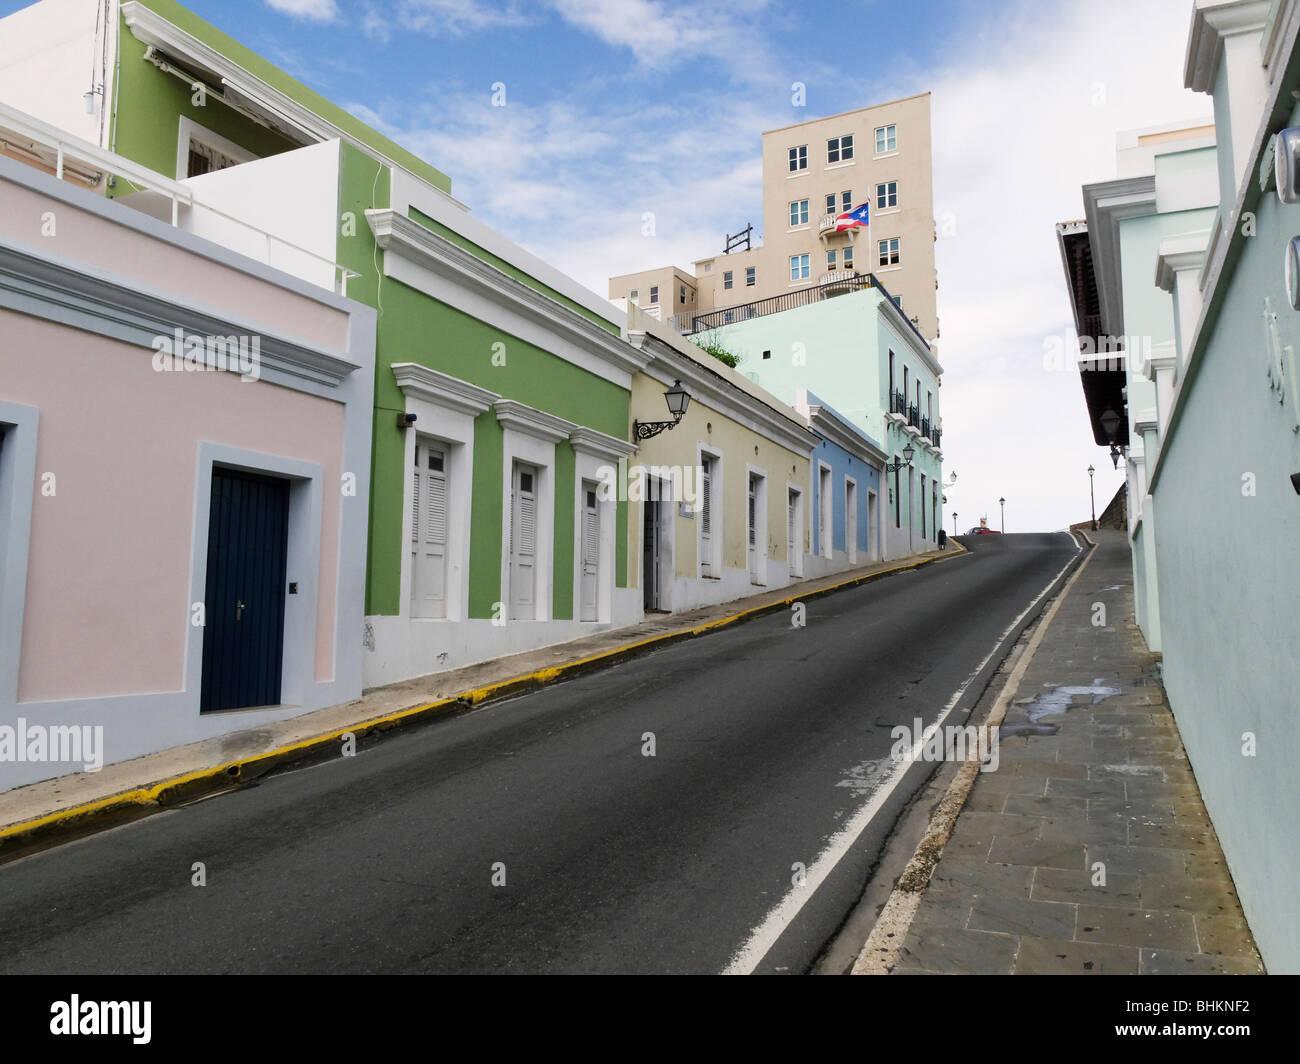 Steep Street in Old San Juan, Calle Norzagaray, Puerto Rico - Stock Image